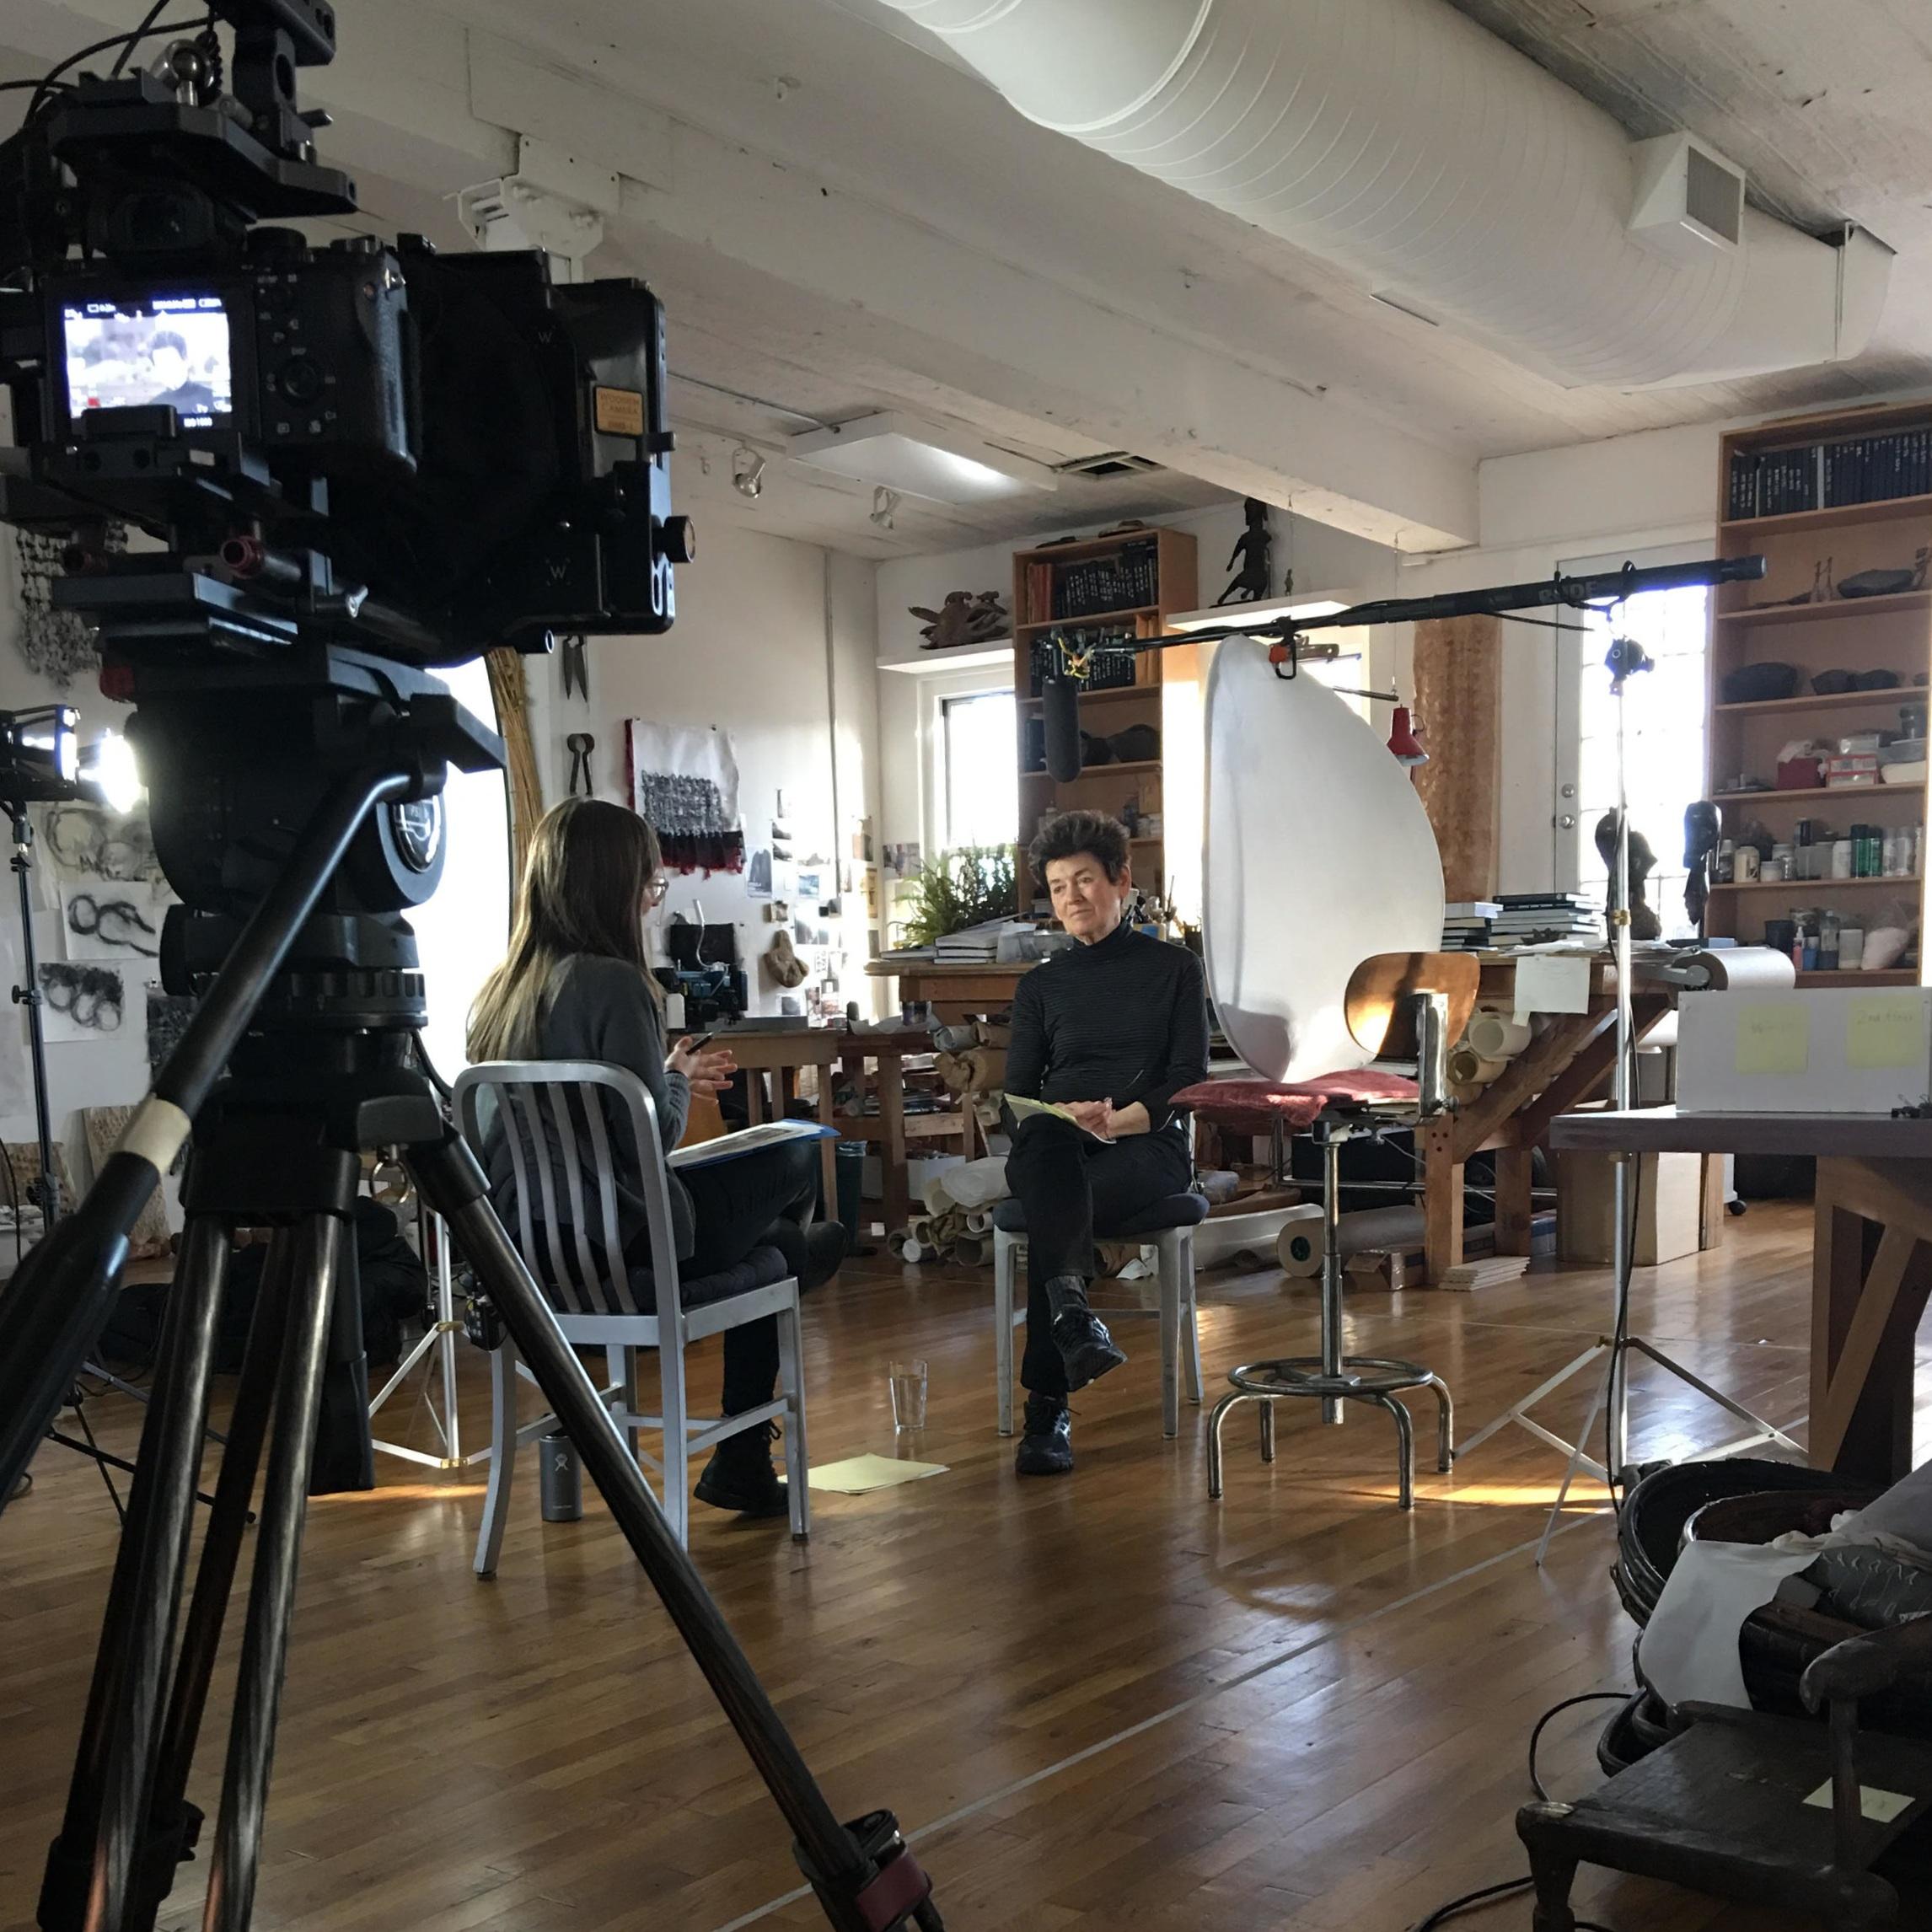 Interviewing artist Ursula von Rydingsvard for the Storm King Oral History Program